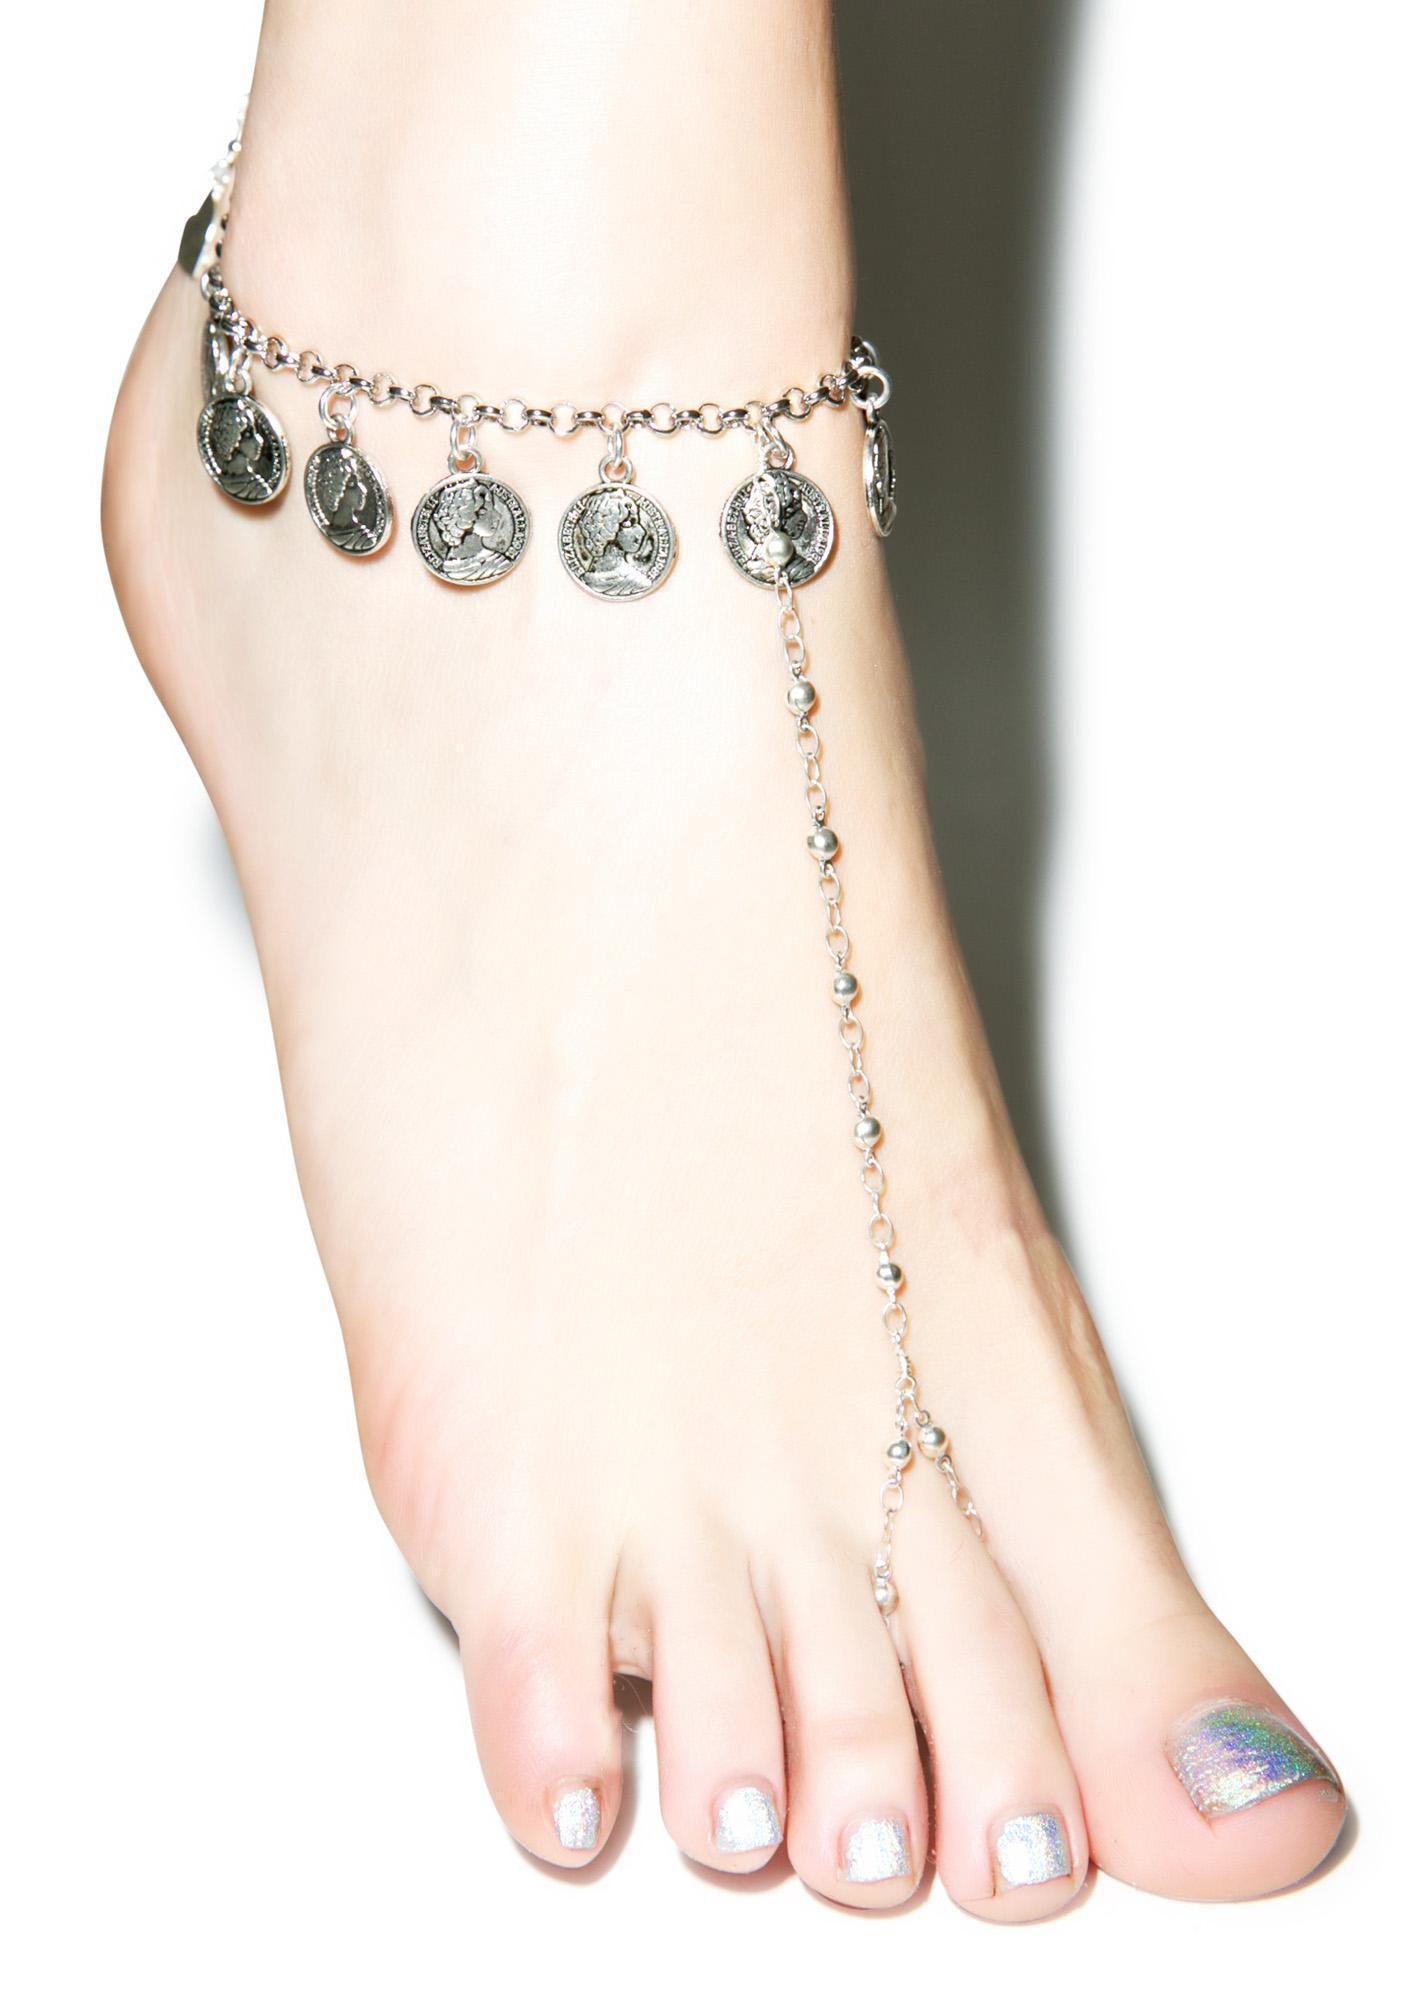 Vidakush x Mod Coin Foot Chain